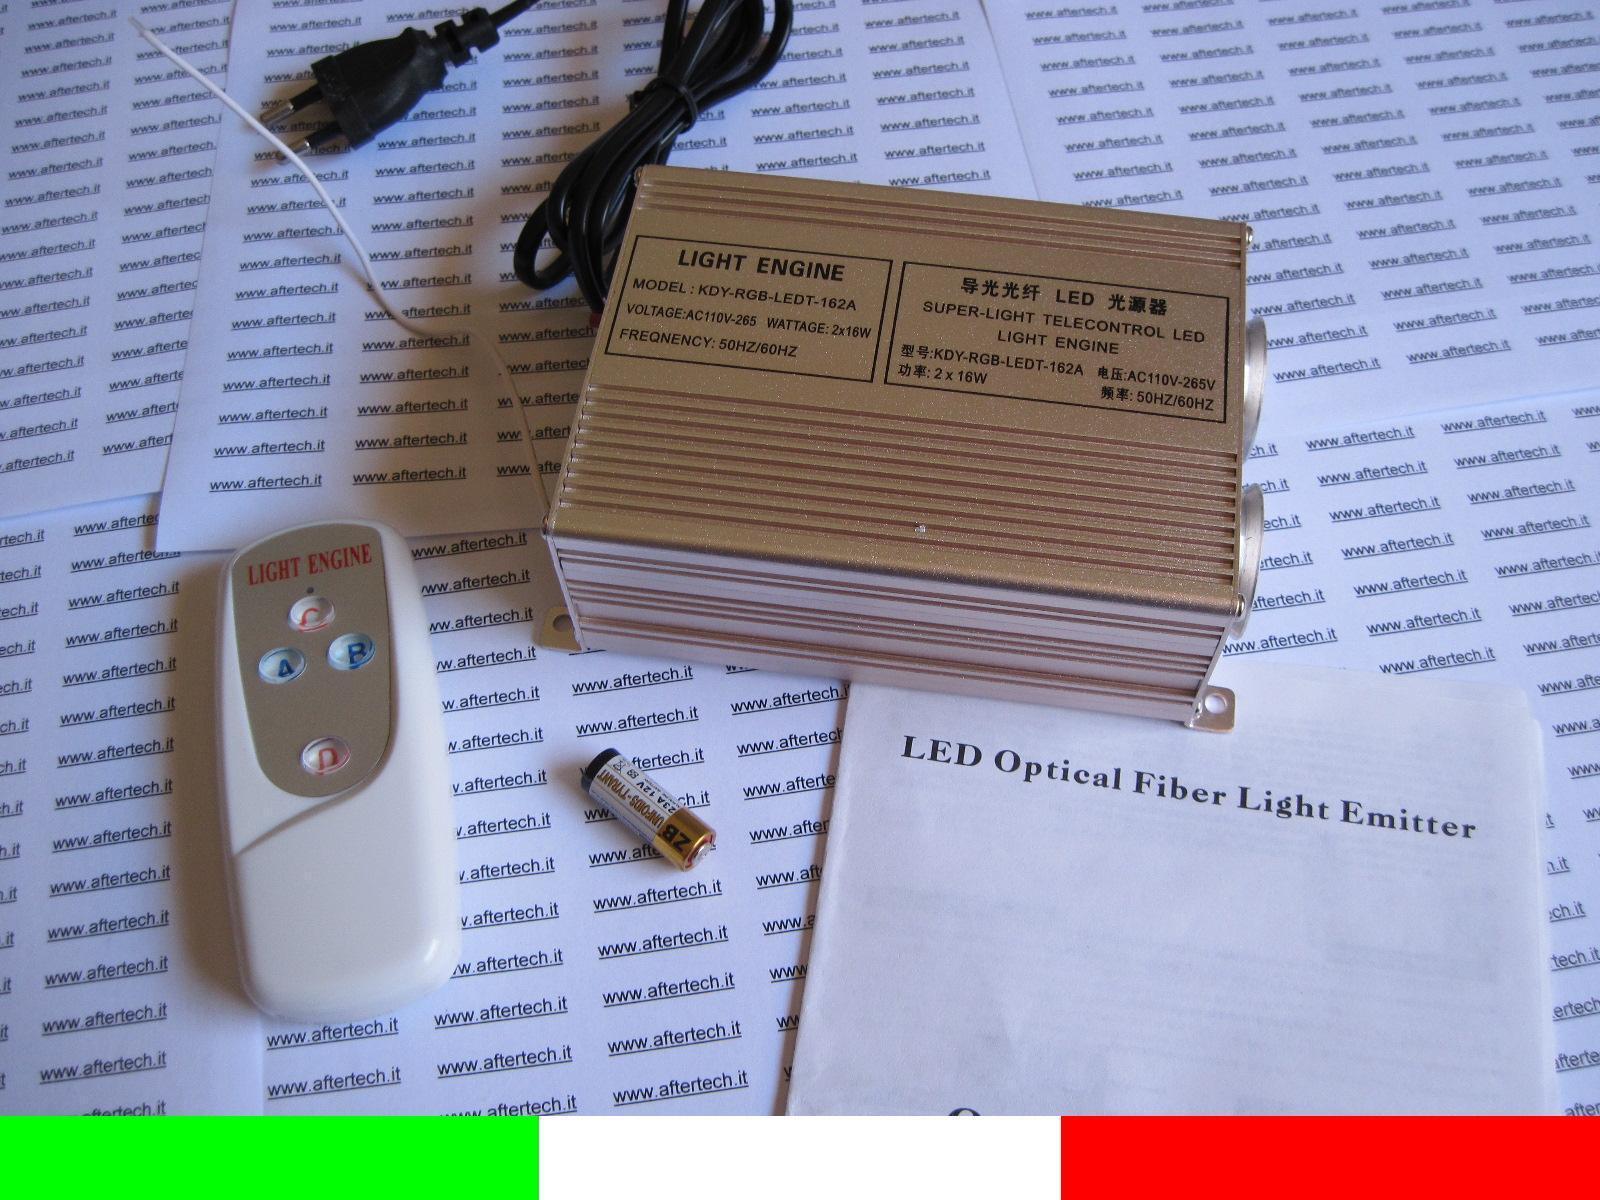 Emisor 18w Doble LED blancoo Cálido para Kit Fibra Óptica Luz Cielo Stellato